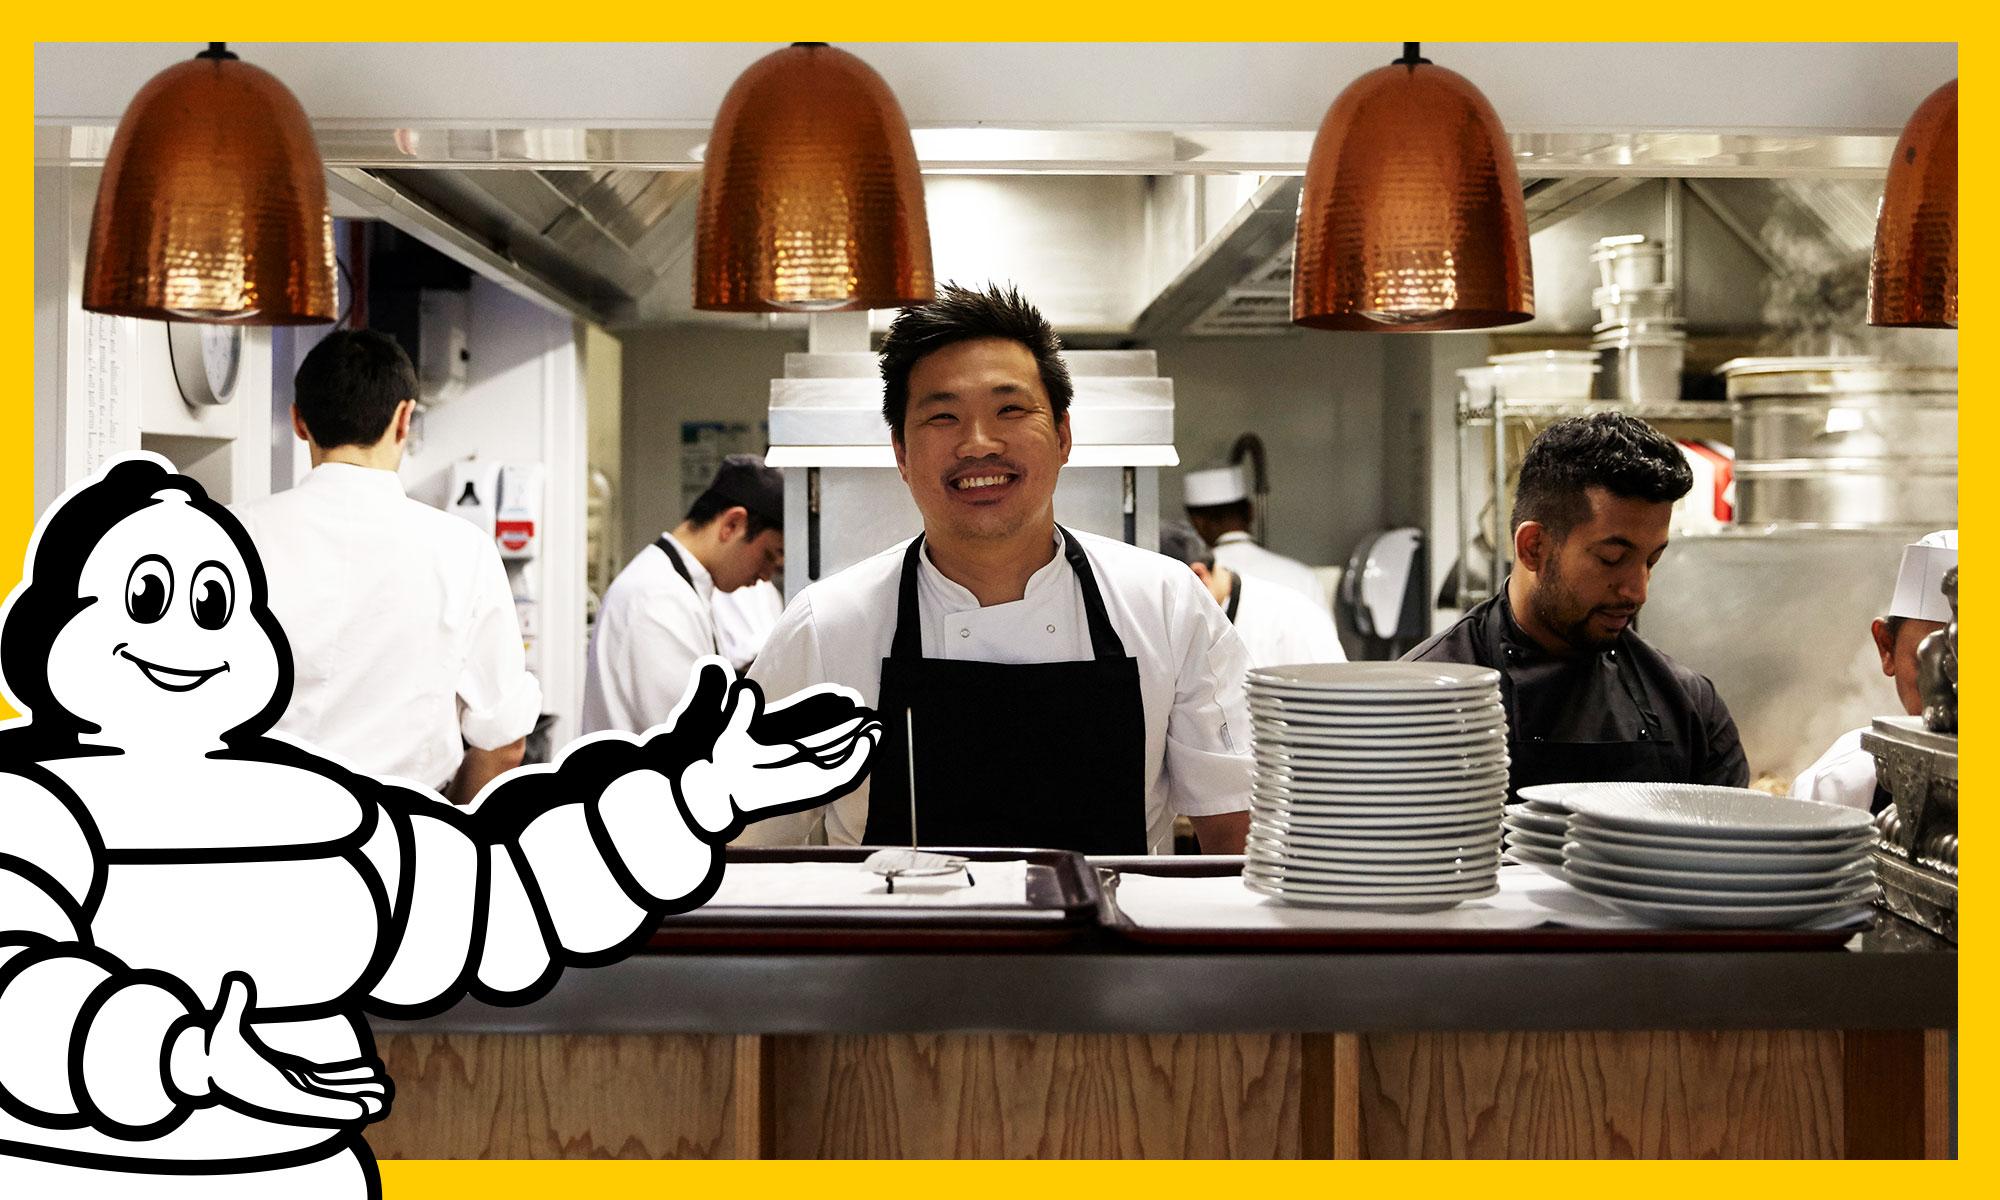 London Michelin Restaurants - Eater London